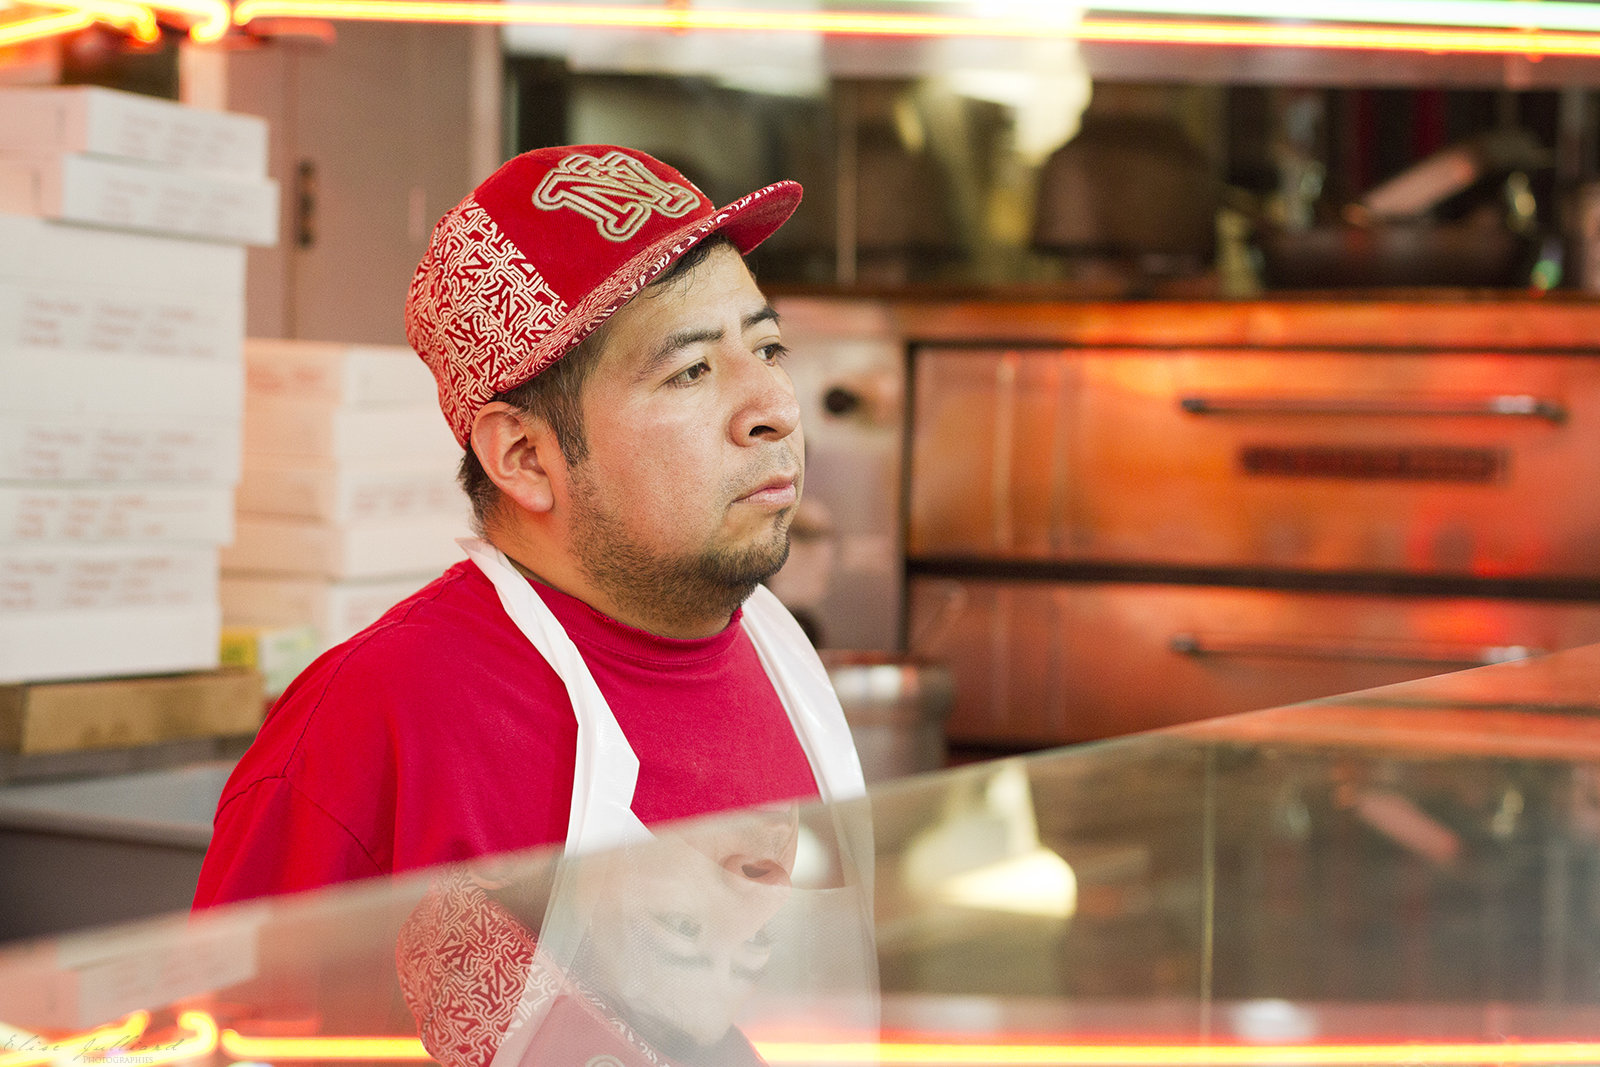 elise-julliard-photographe-new-york-etats-unis-usa-portrait-pizza